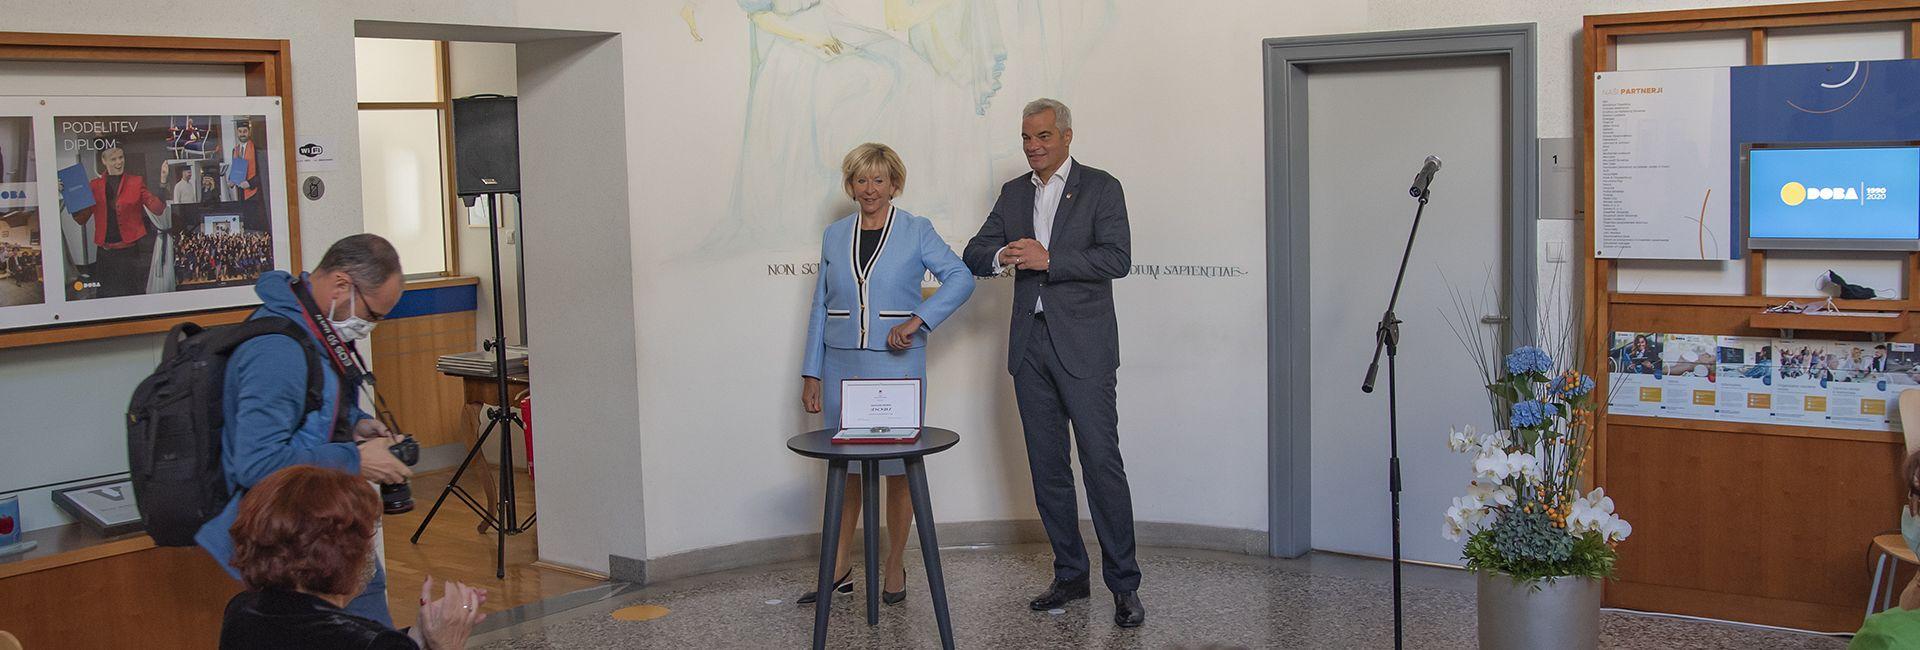 Gradonačelnik grada Maribora dodelio DOBI povodom 30. godišnjice Pečat grada